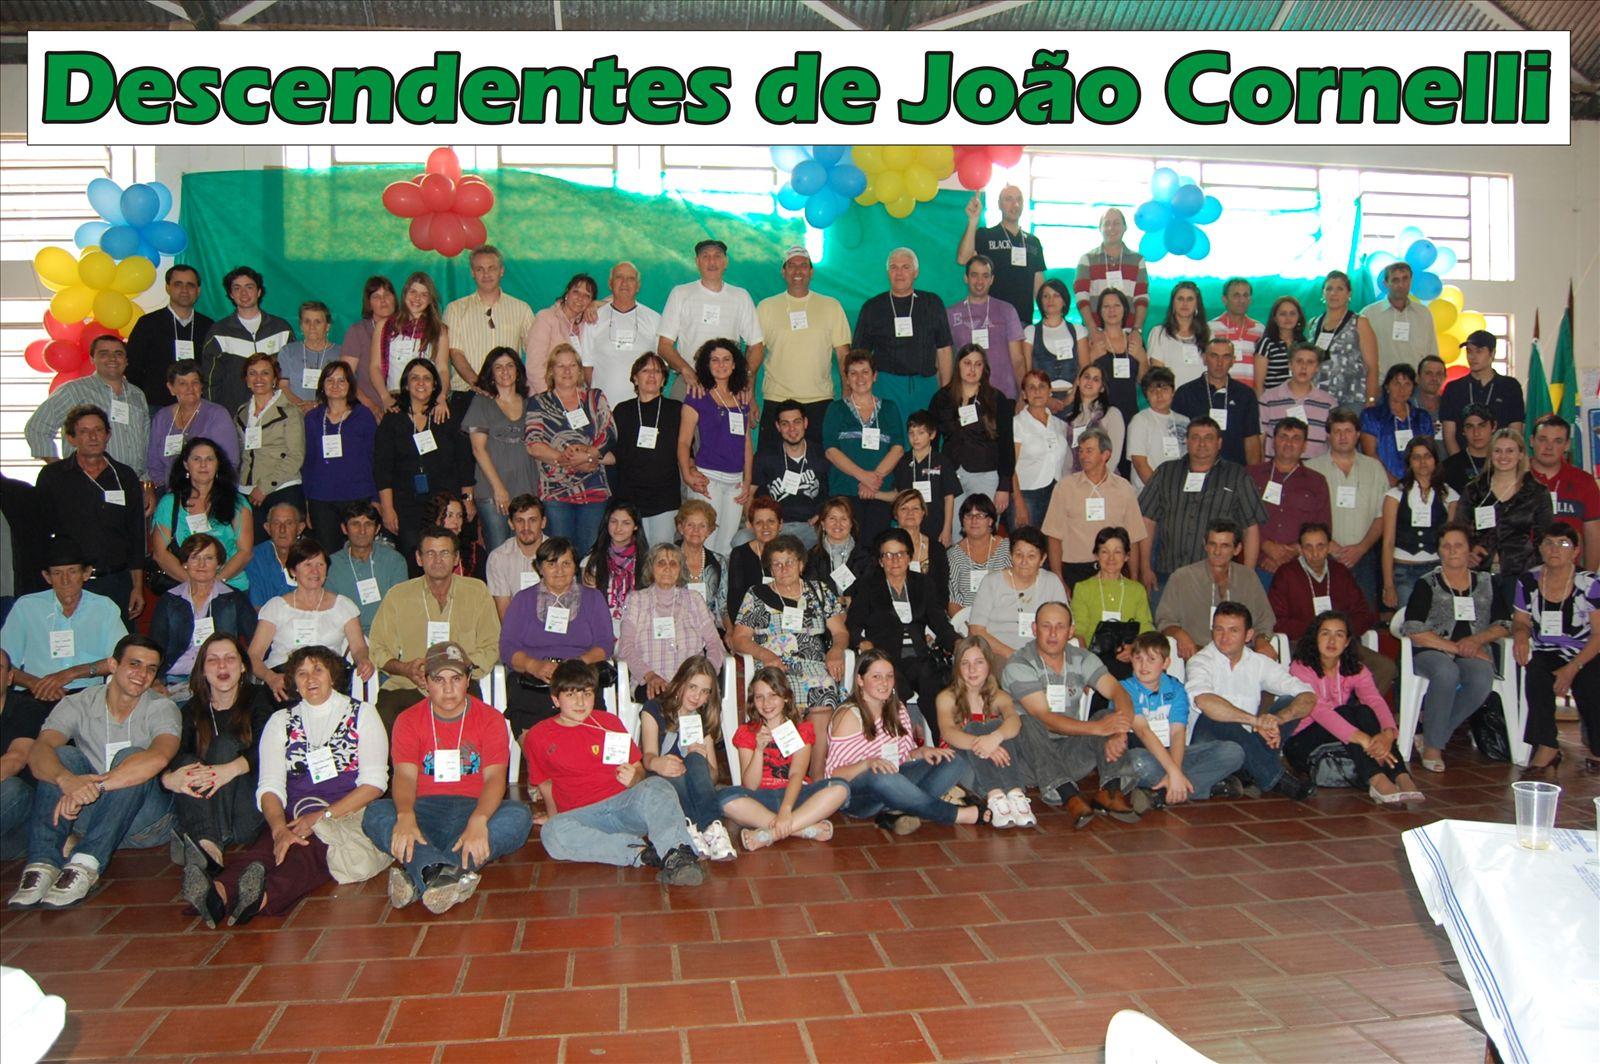 Descendentes_de_João_Cornelli_01_0